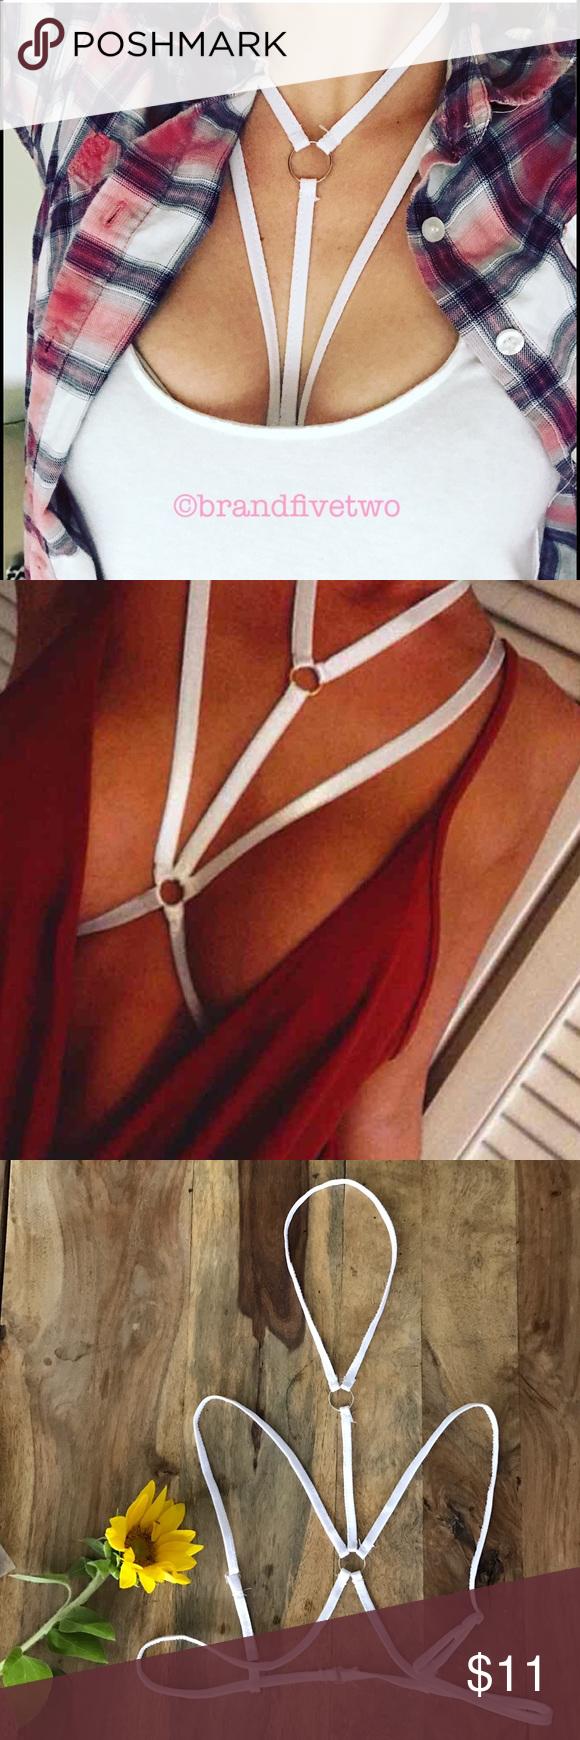 Sexy body harness in white Boutique   Nähmuster, Mode zum ...